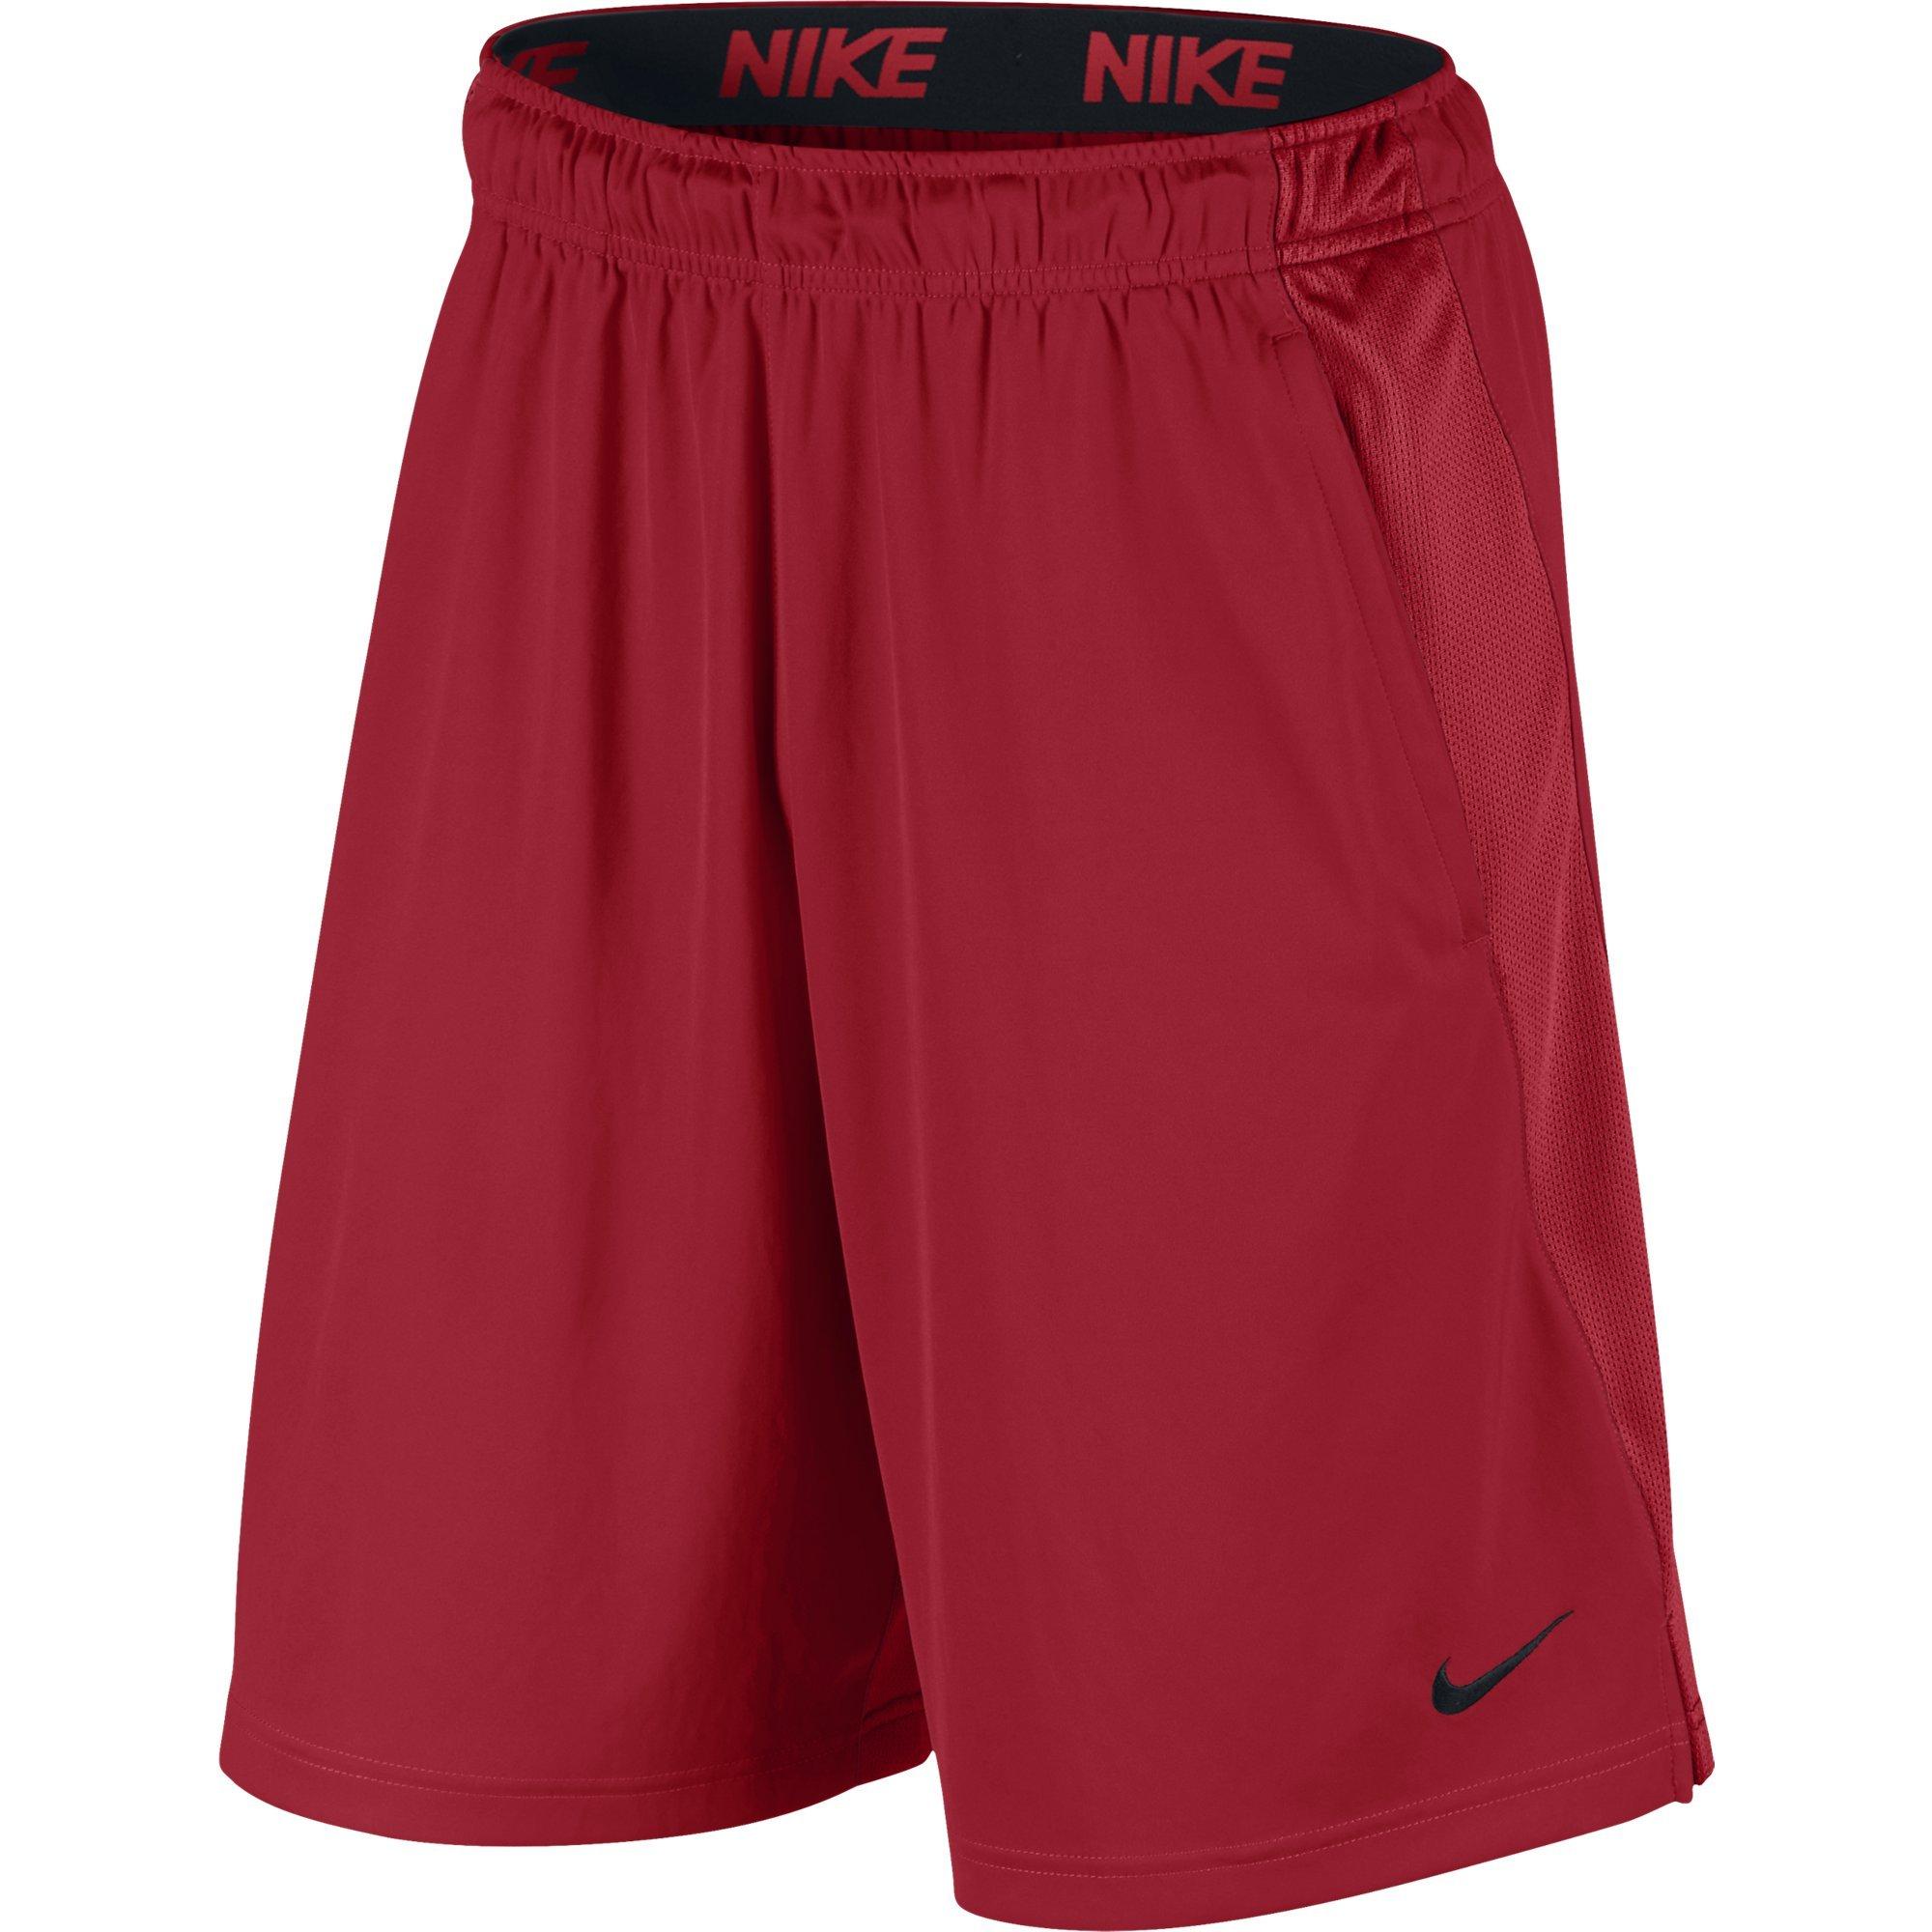 NIKE Men's Dry Training Shorts, University Red/University Red/Black, X-Large